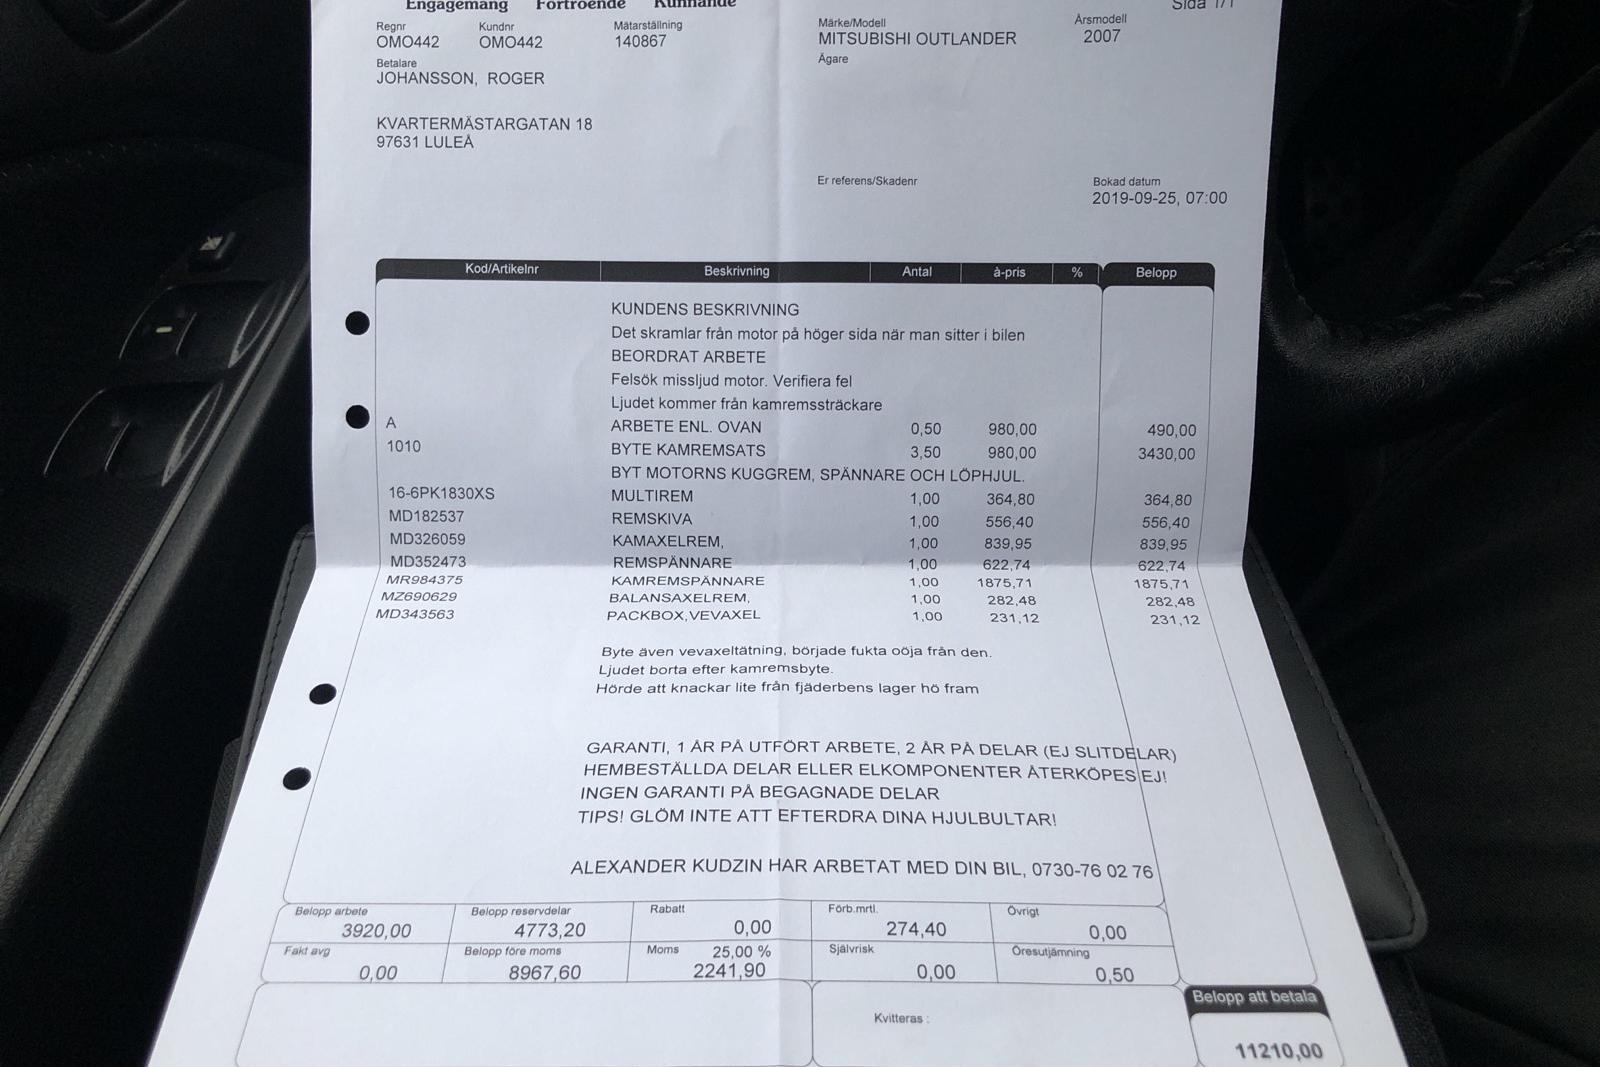 Mitsubishi Outlander 2.0 Turbo (202hk) - 145 790 km - Manual - Dark Grey - 2007